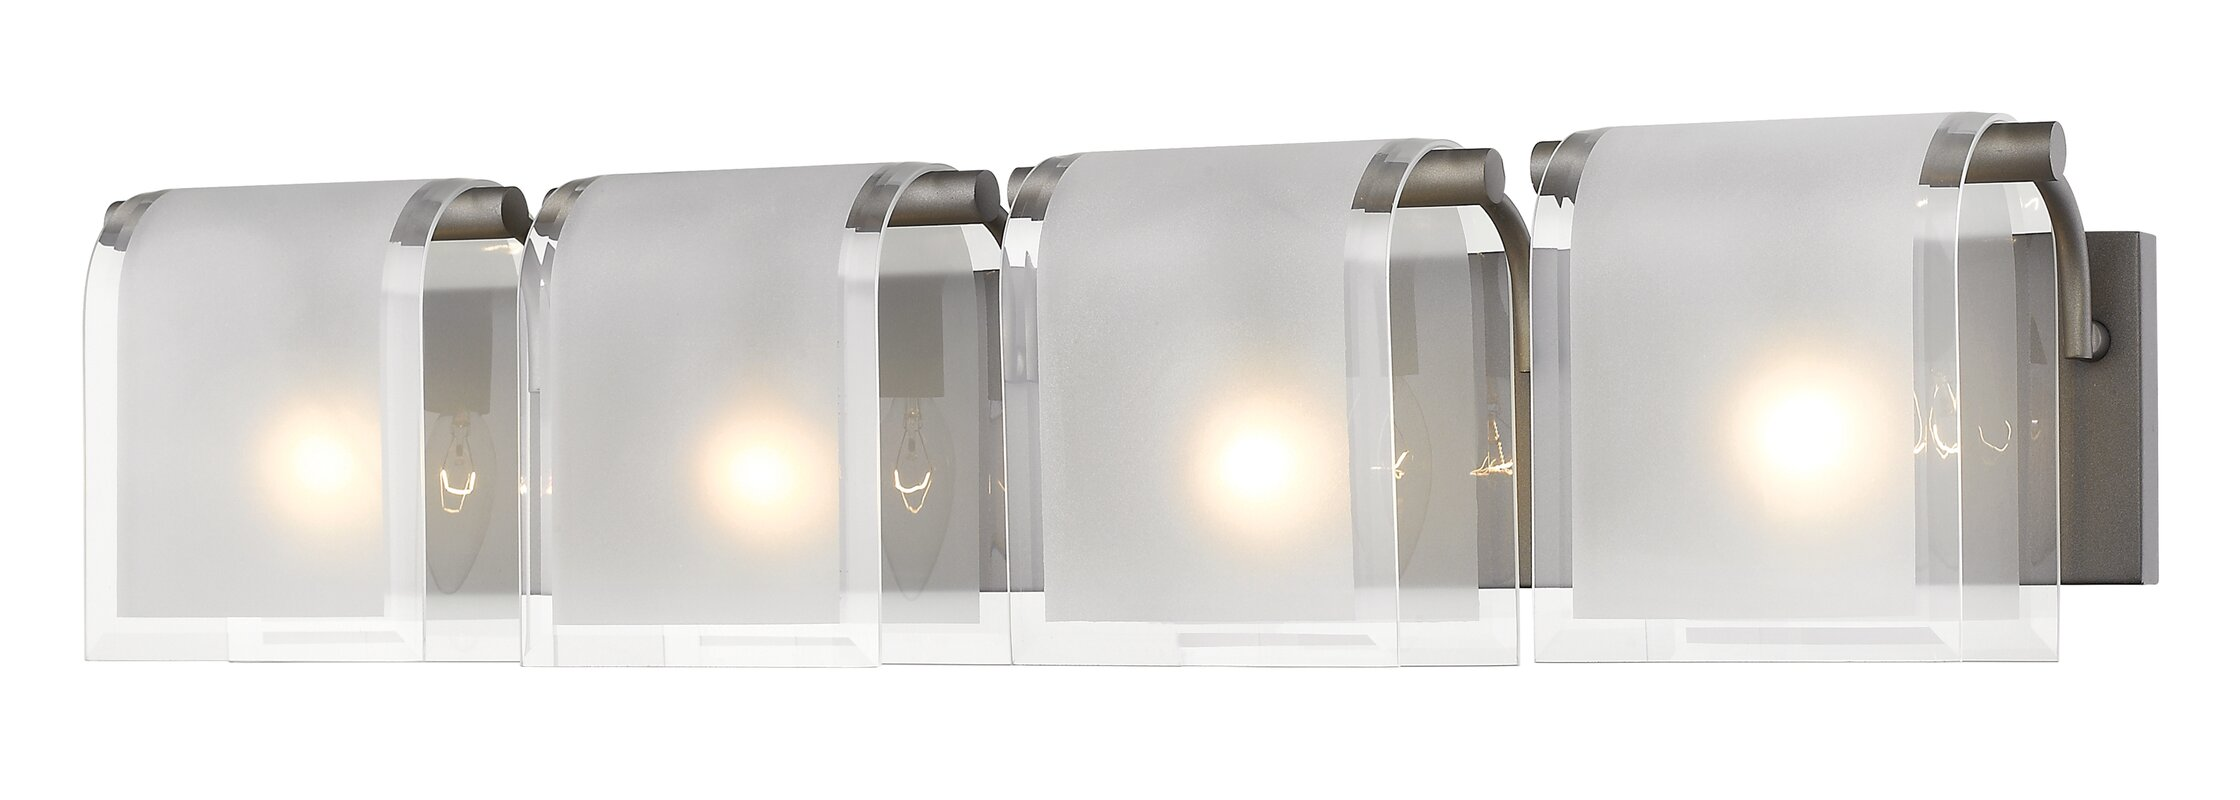 Orren ellis kadlec 4 light bath bar reviews wayfair kadlec 4 light bath bar aloadofball Images